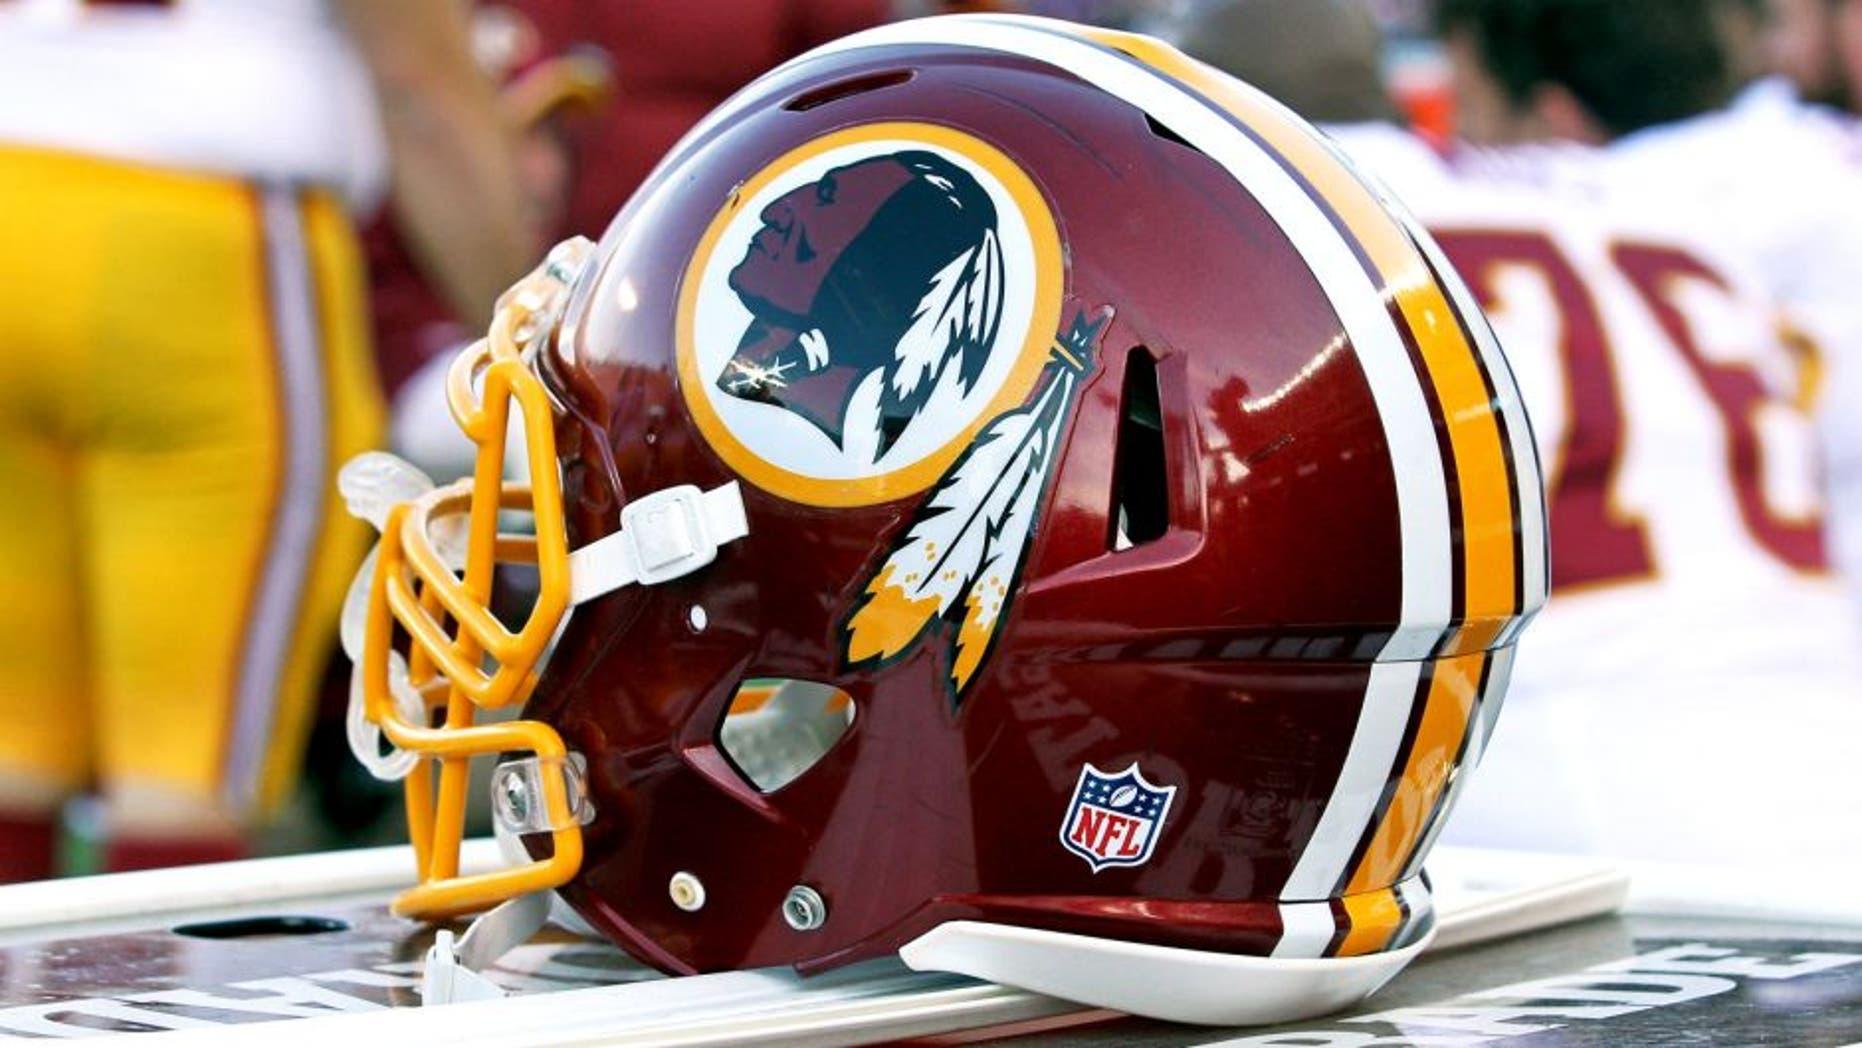 Nov 2, 2014; Minneapolis, MN, USA; A Washington Redskins helmet on the bench during the fourth quarter against the Minnesota Vikings at TCF Bank Stadium. The Vikings defeated the Redskins 29-26. Mandatory Credit: Brace Hemmelgarn-USA TODAY Sports